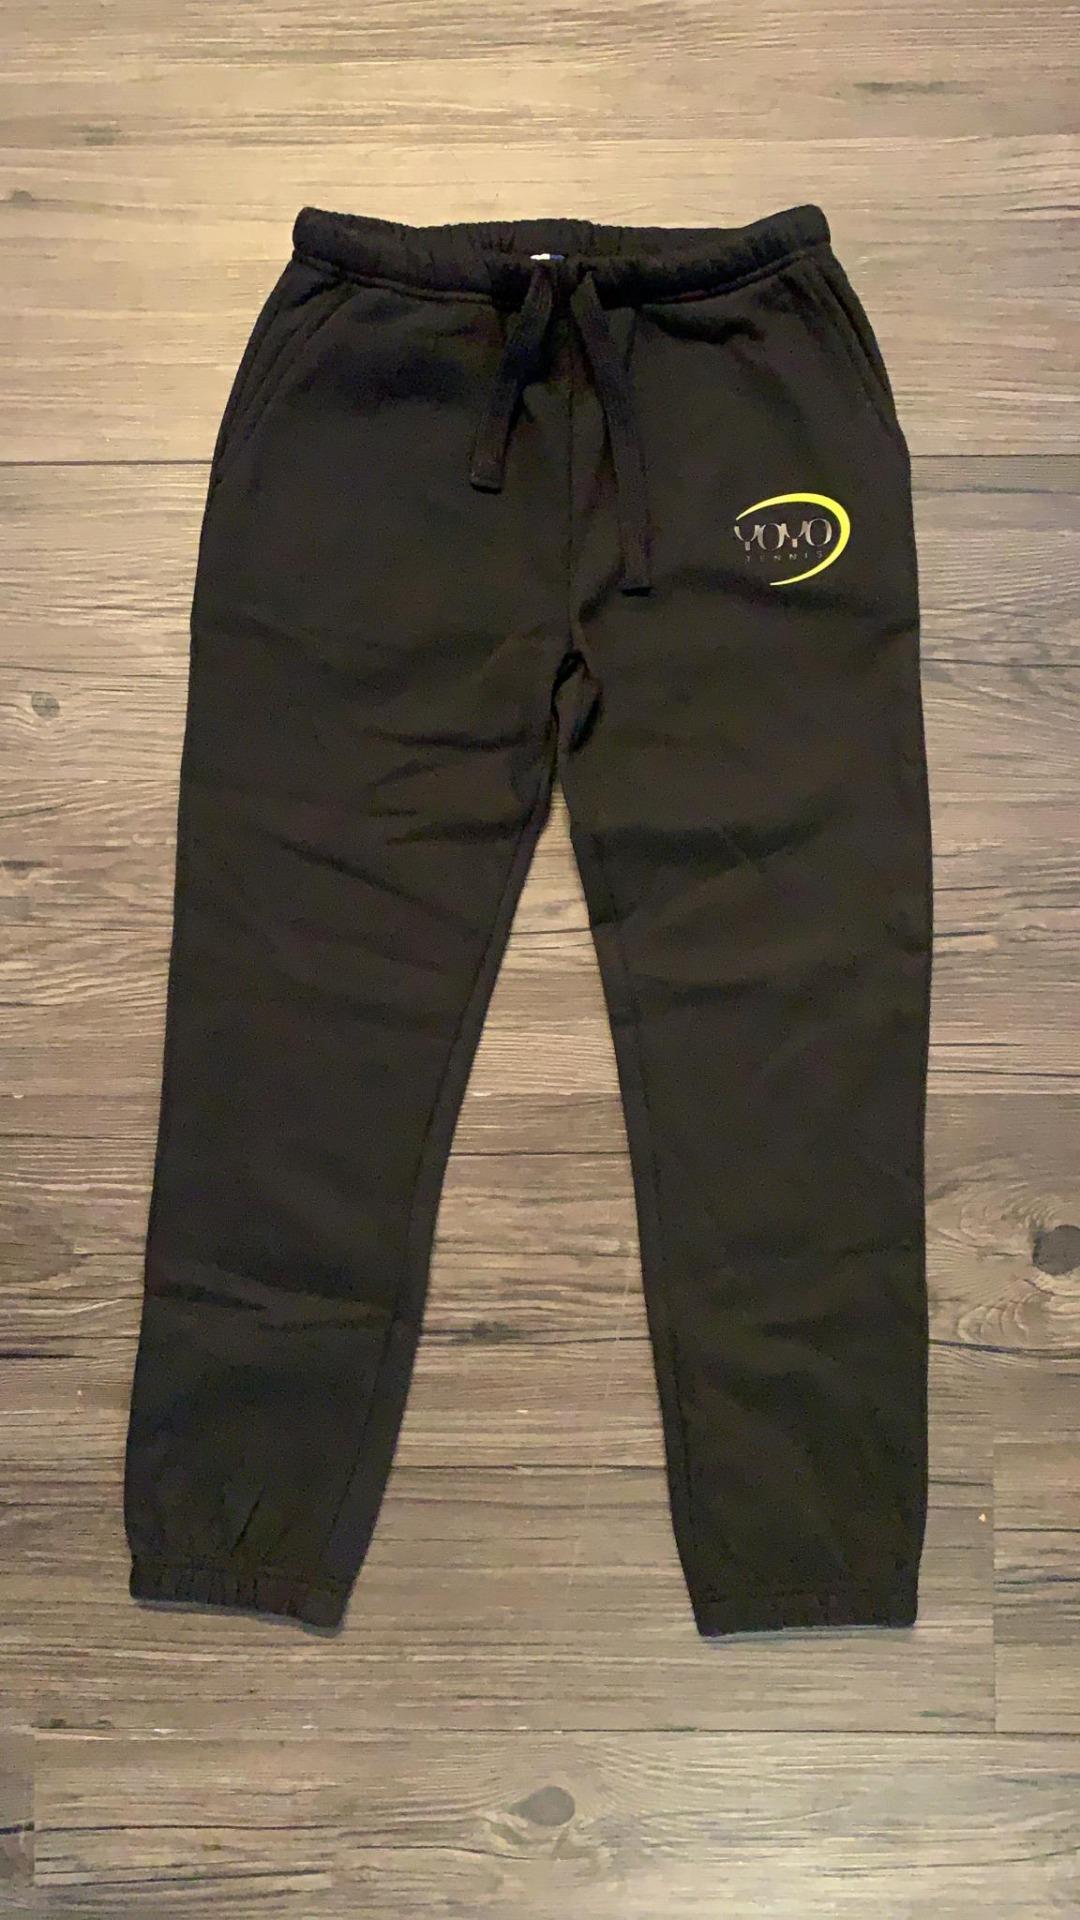 YOYO-TENNIS Pant Nero con Logo Giallo Bambino 1